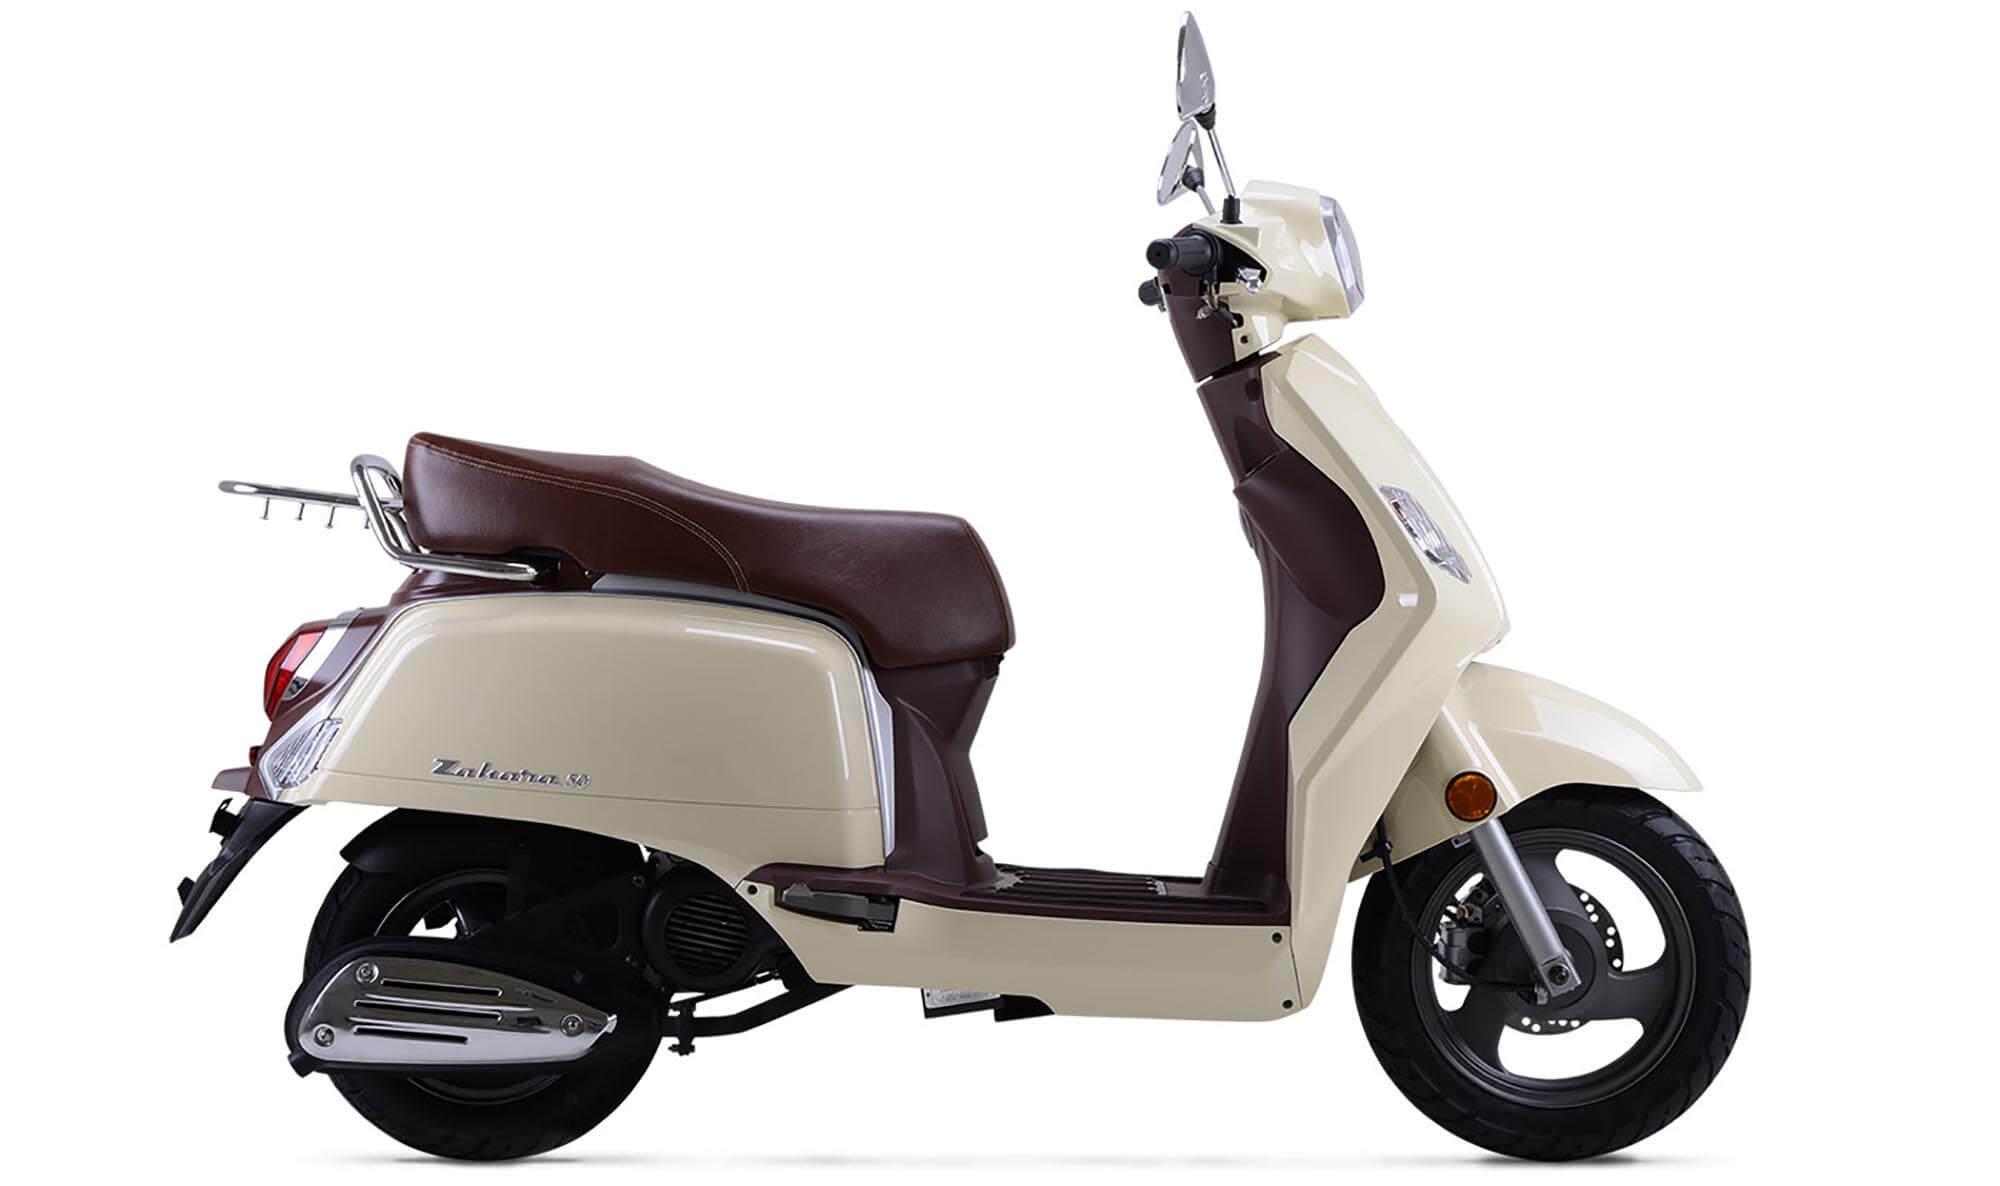 comprar-motos-keeway-zahara-blanco-motissimo-barcelona